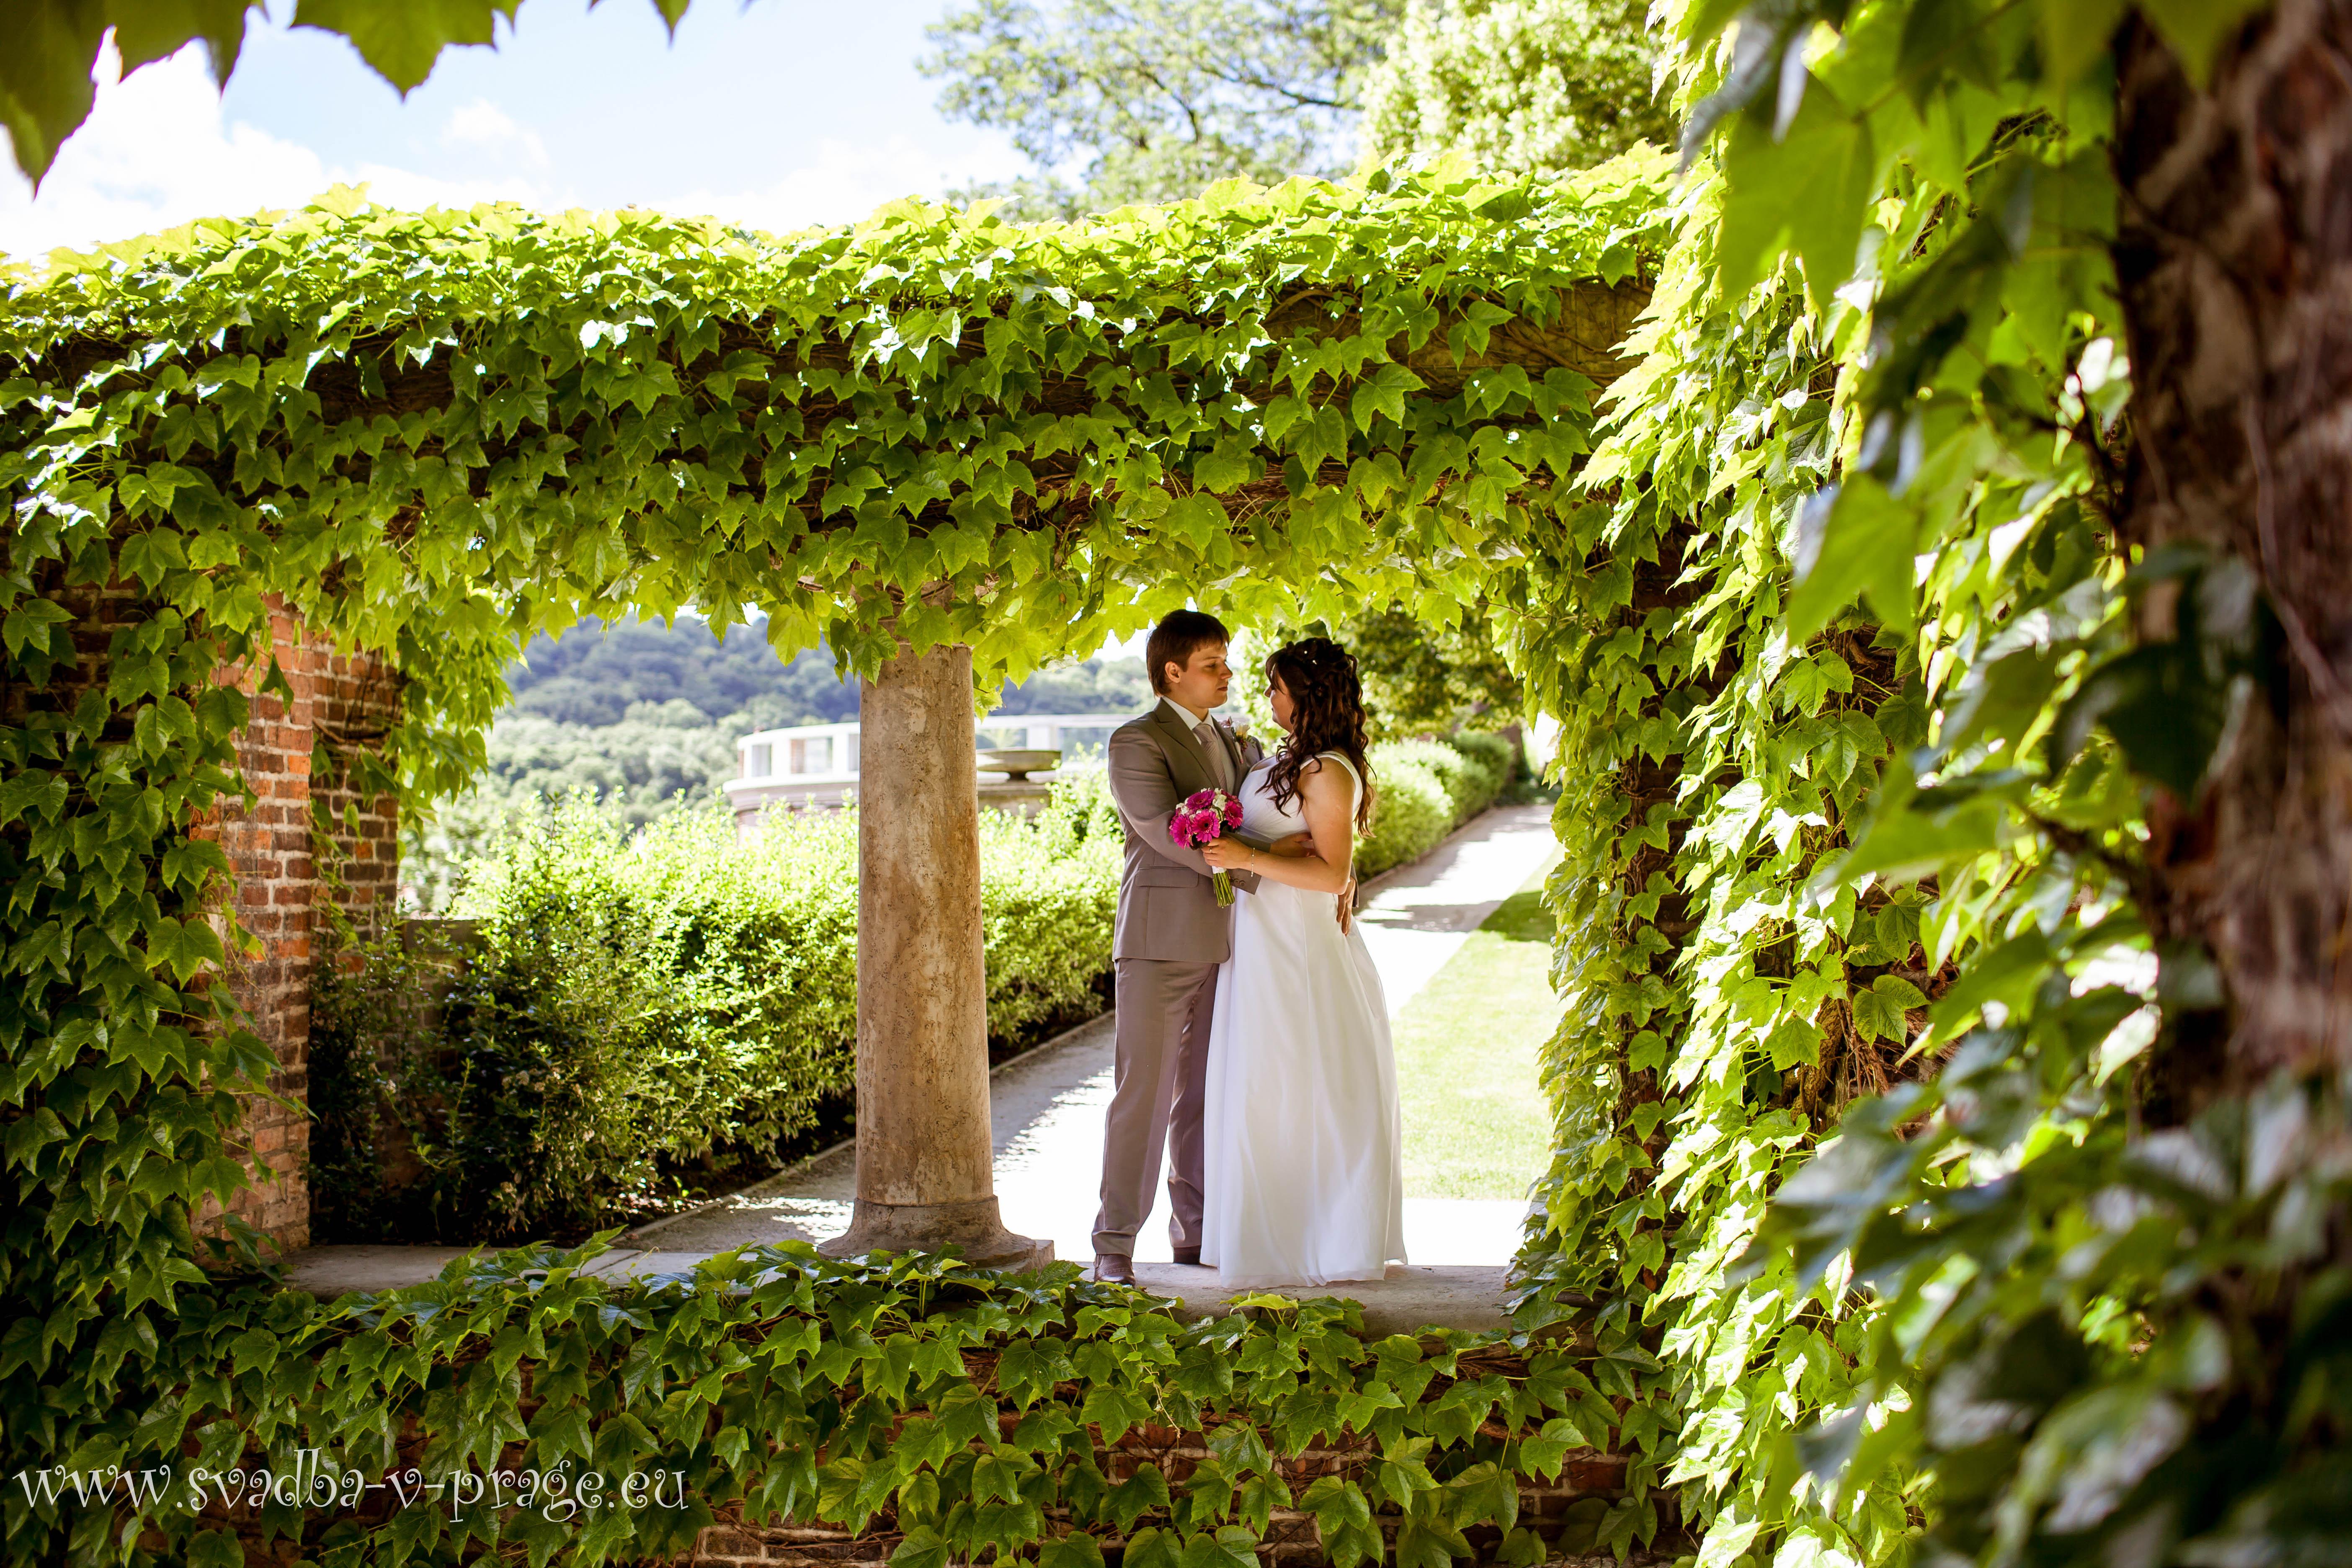 Свадьба в Праге Александра и Анастасии 14.6.2013 во дворце Алипранди - фото Свадьба в Праге